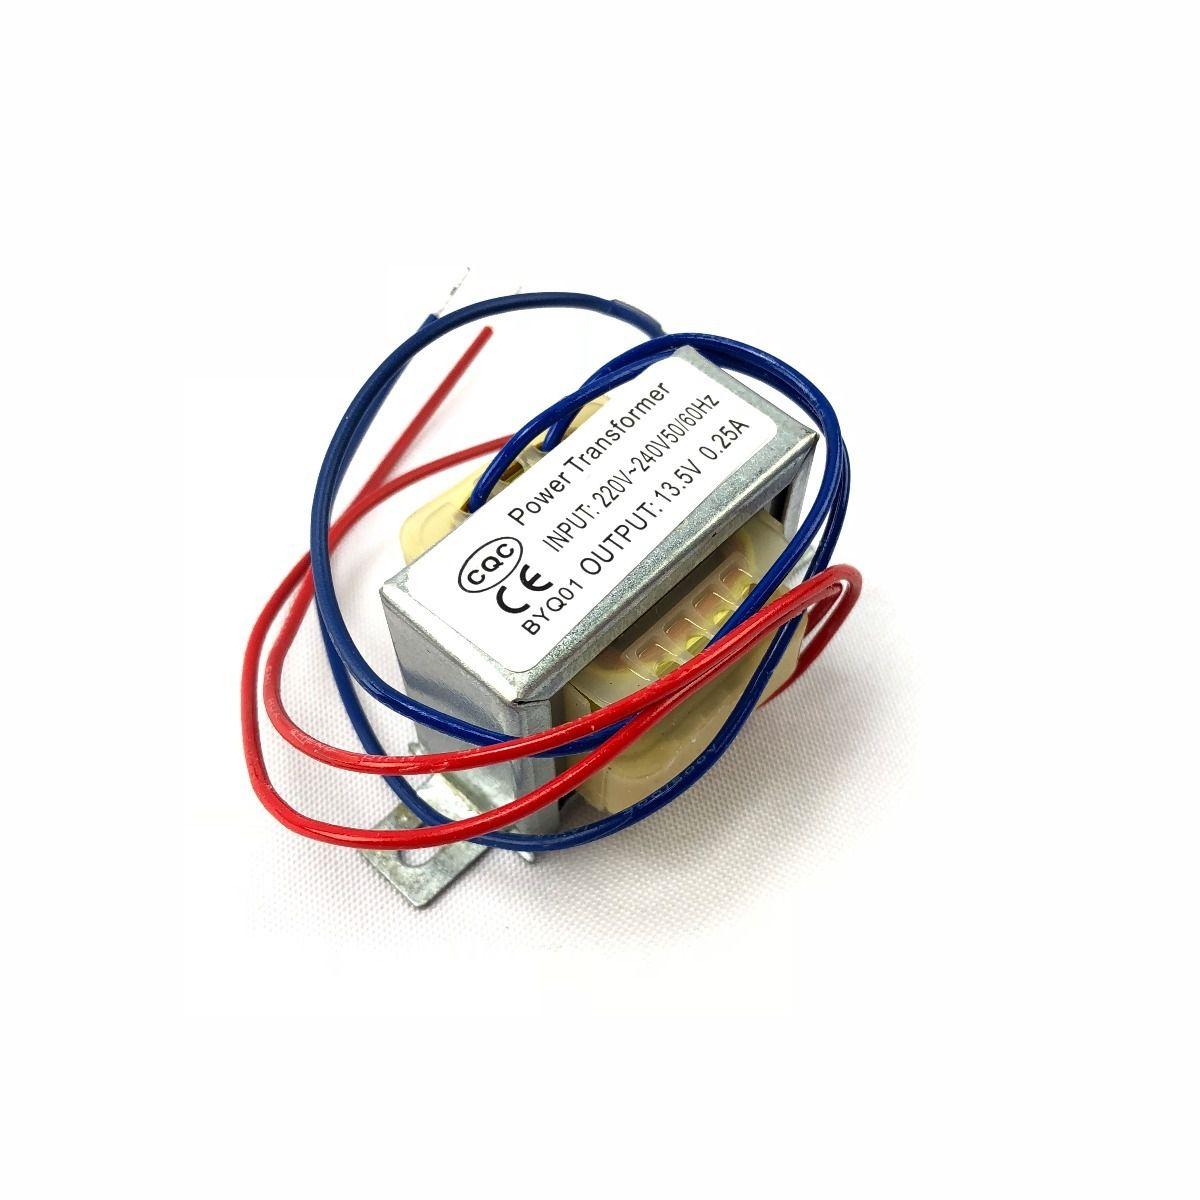 Kit Controle Remoto Placa Eletrônica Universal Split Hi Wall QD-U02B Vix